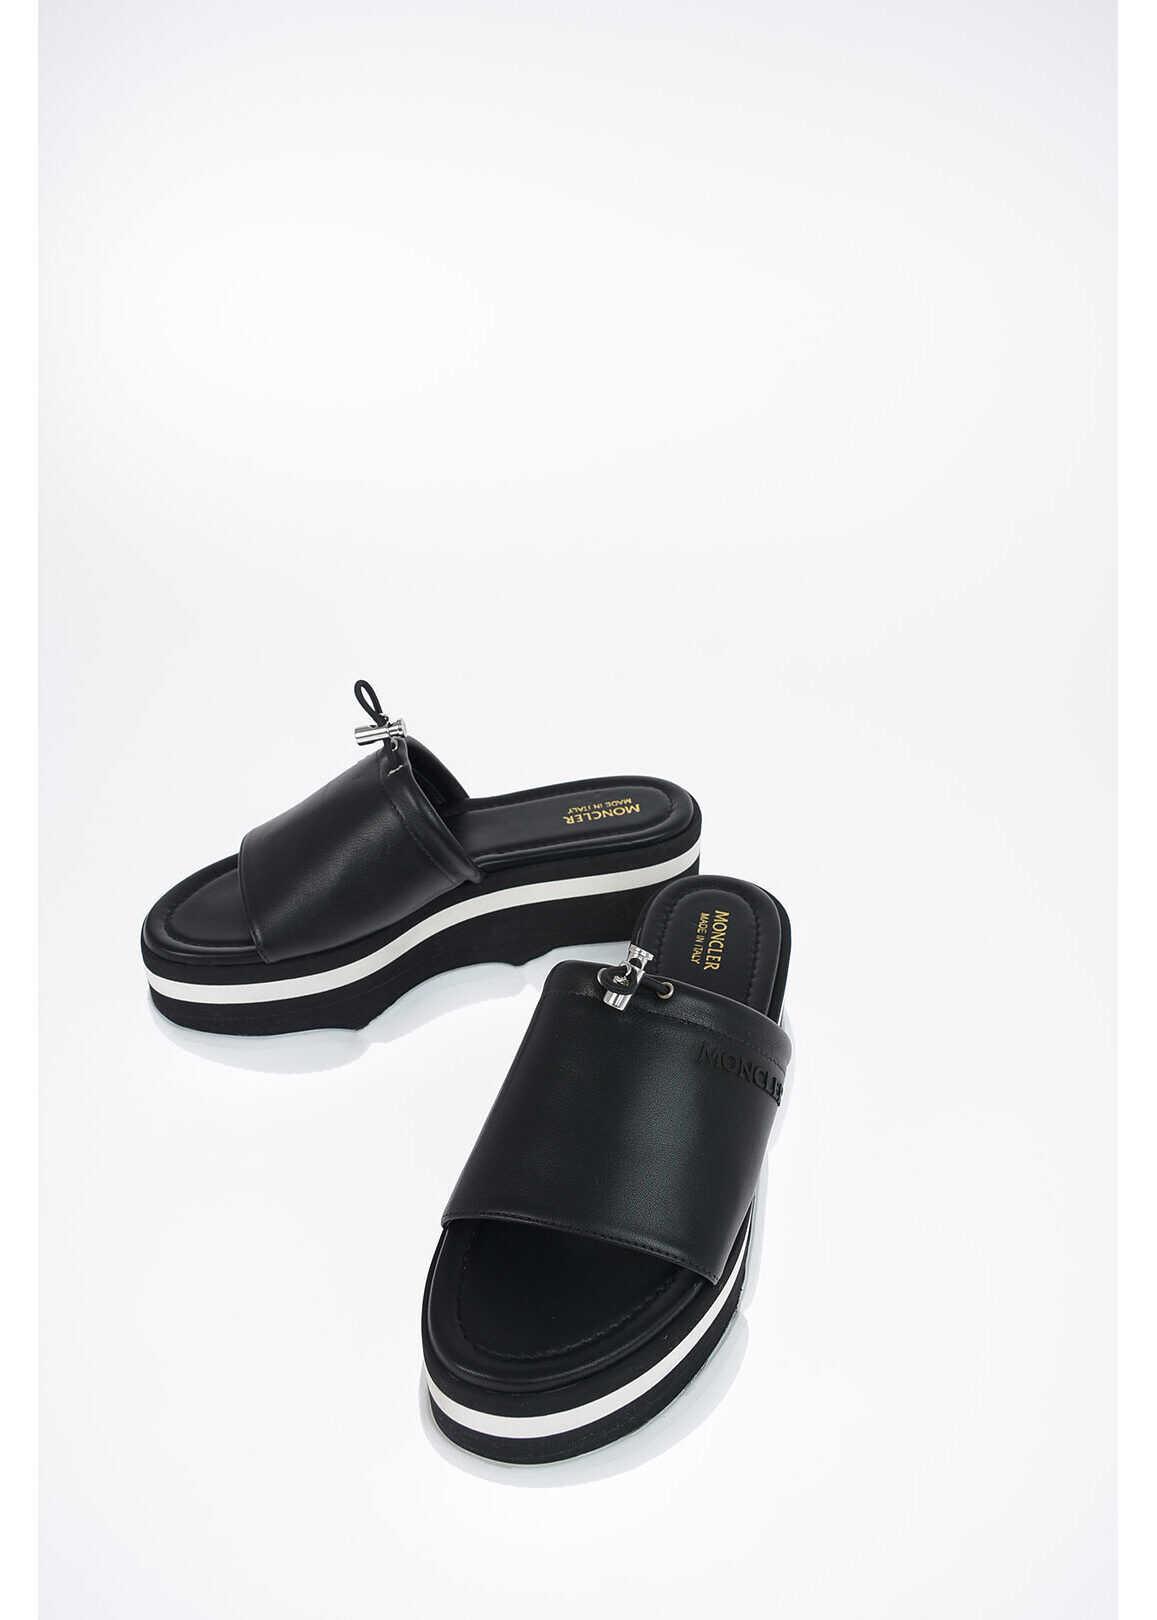 Moncler leather ZAIRA sandals BLACK